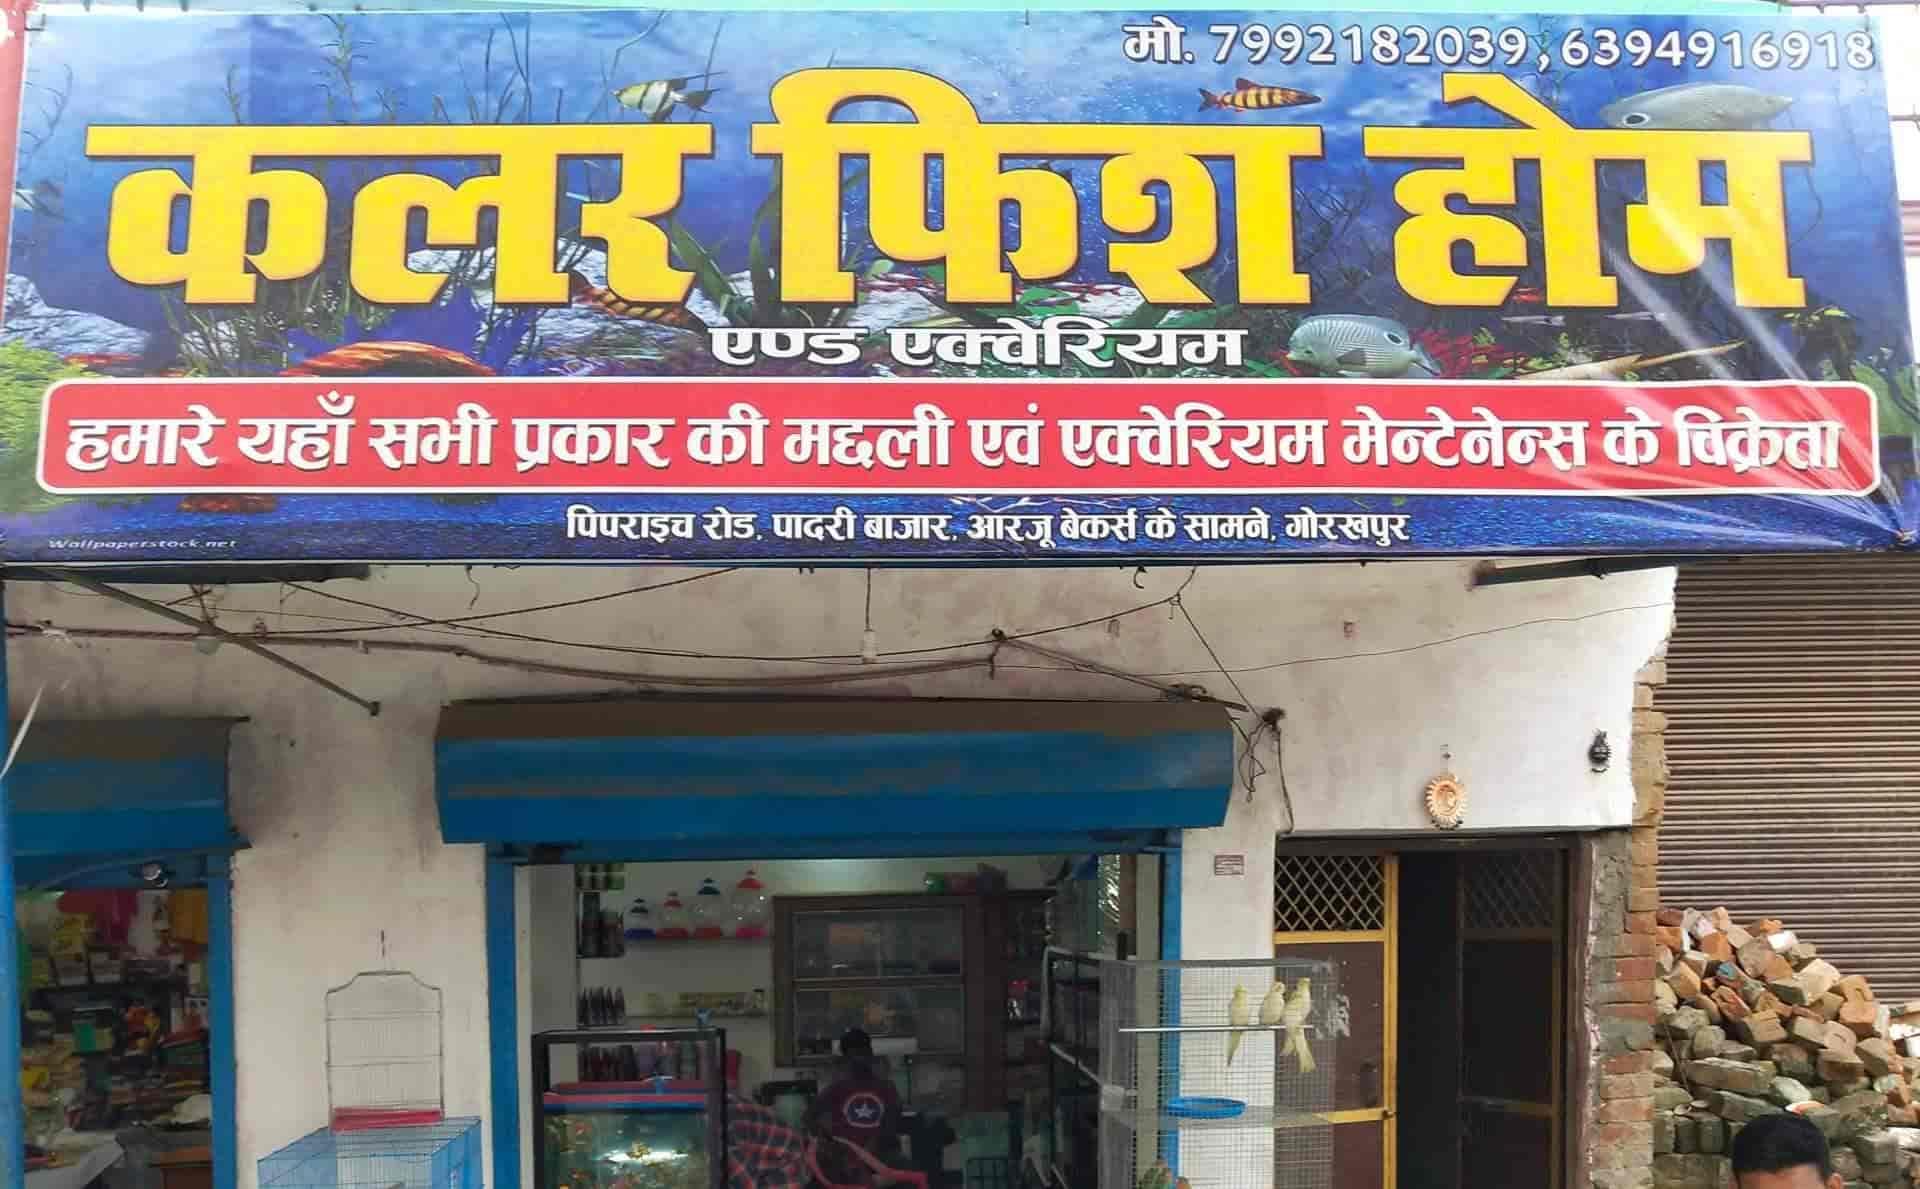 Top 10 Pet Shops For Rabbit in Gorakhpur - Best Pet Stores